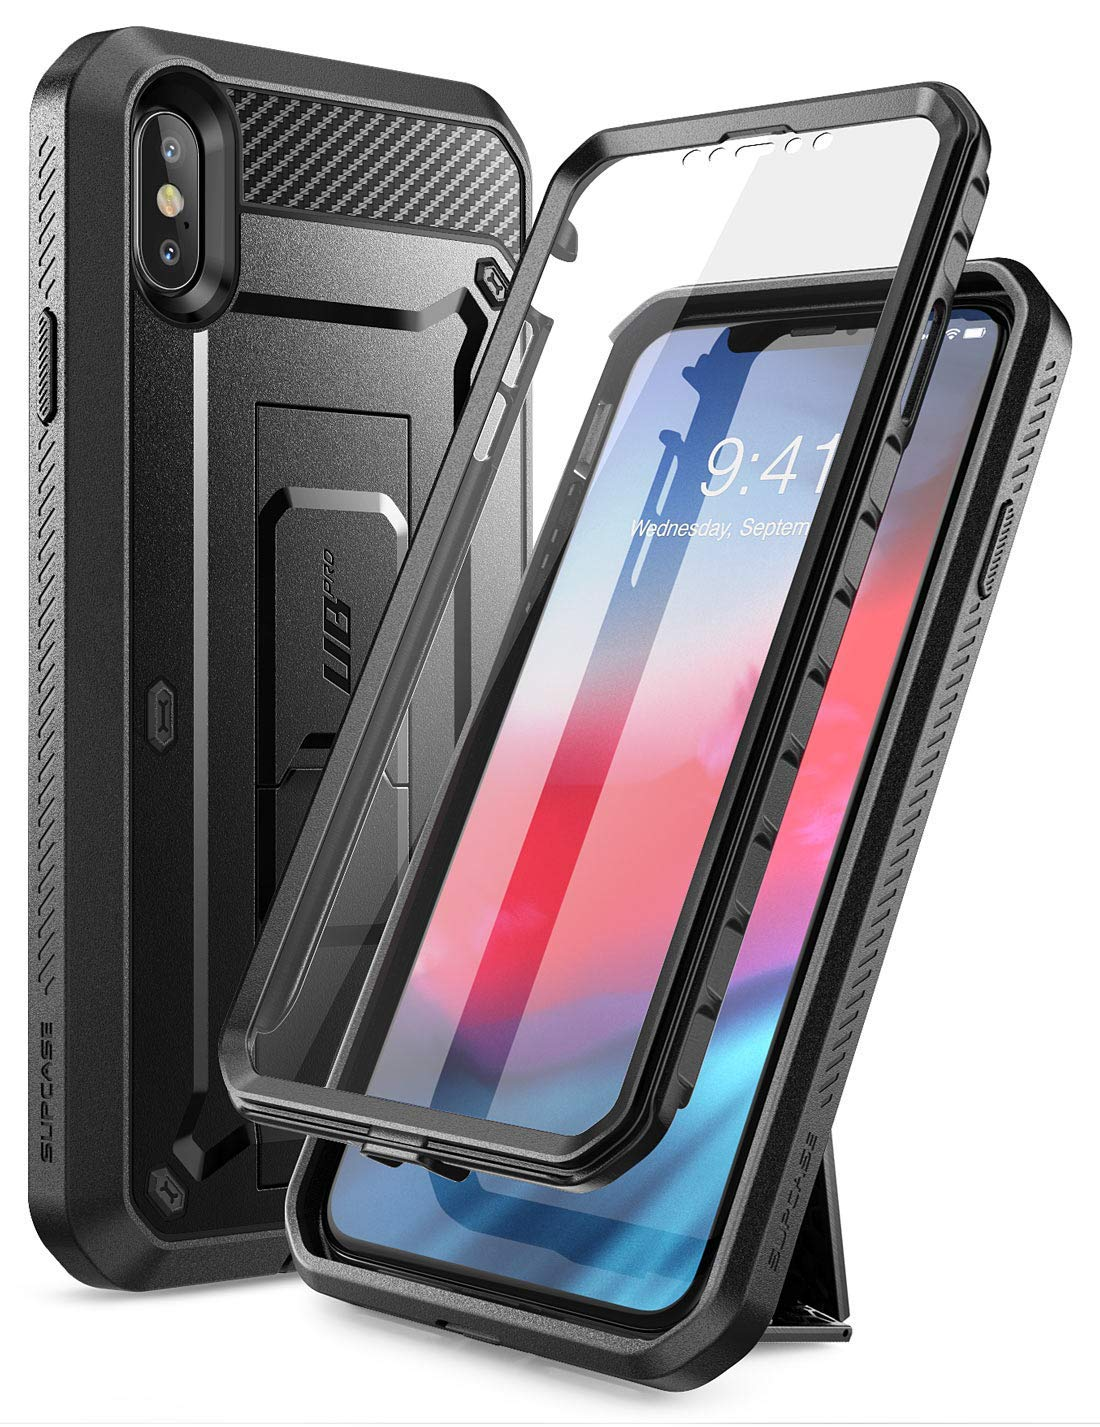 SUPCASE Unicorn Beetle Pro Series iPhone XS Max Case